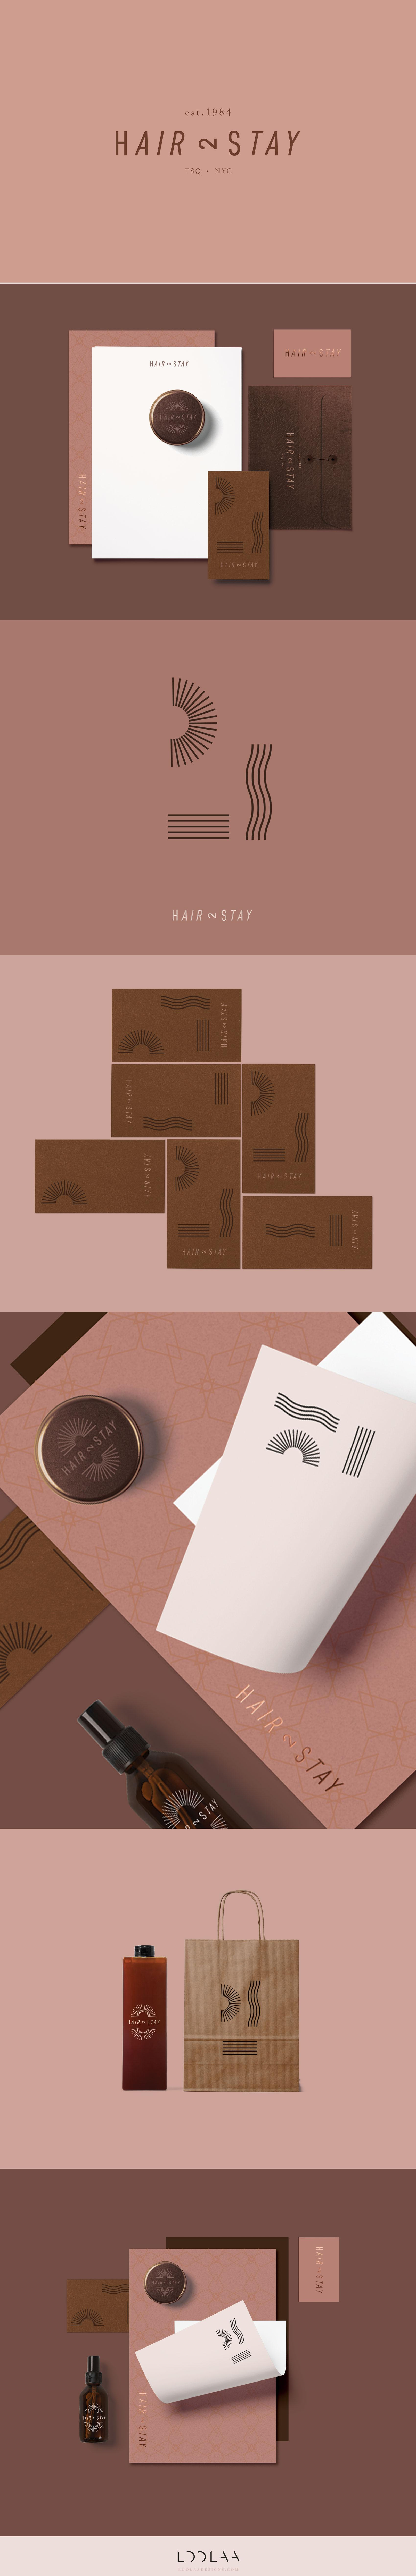 Hair-Salon-Logo-Stationary-Design-LoolaaDesigns.jpg